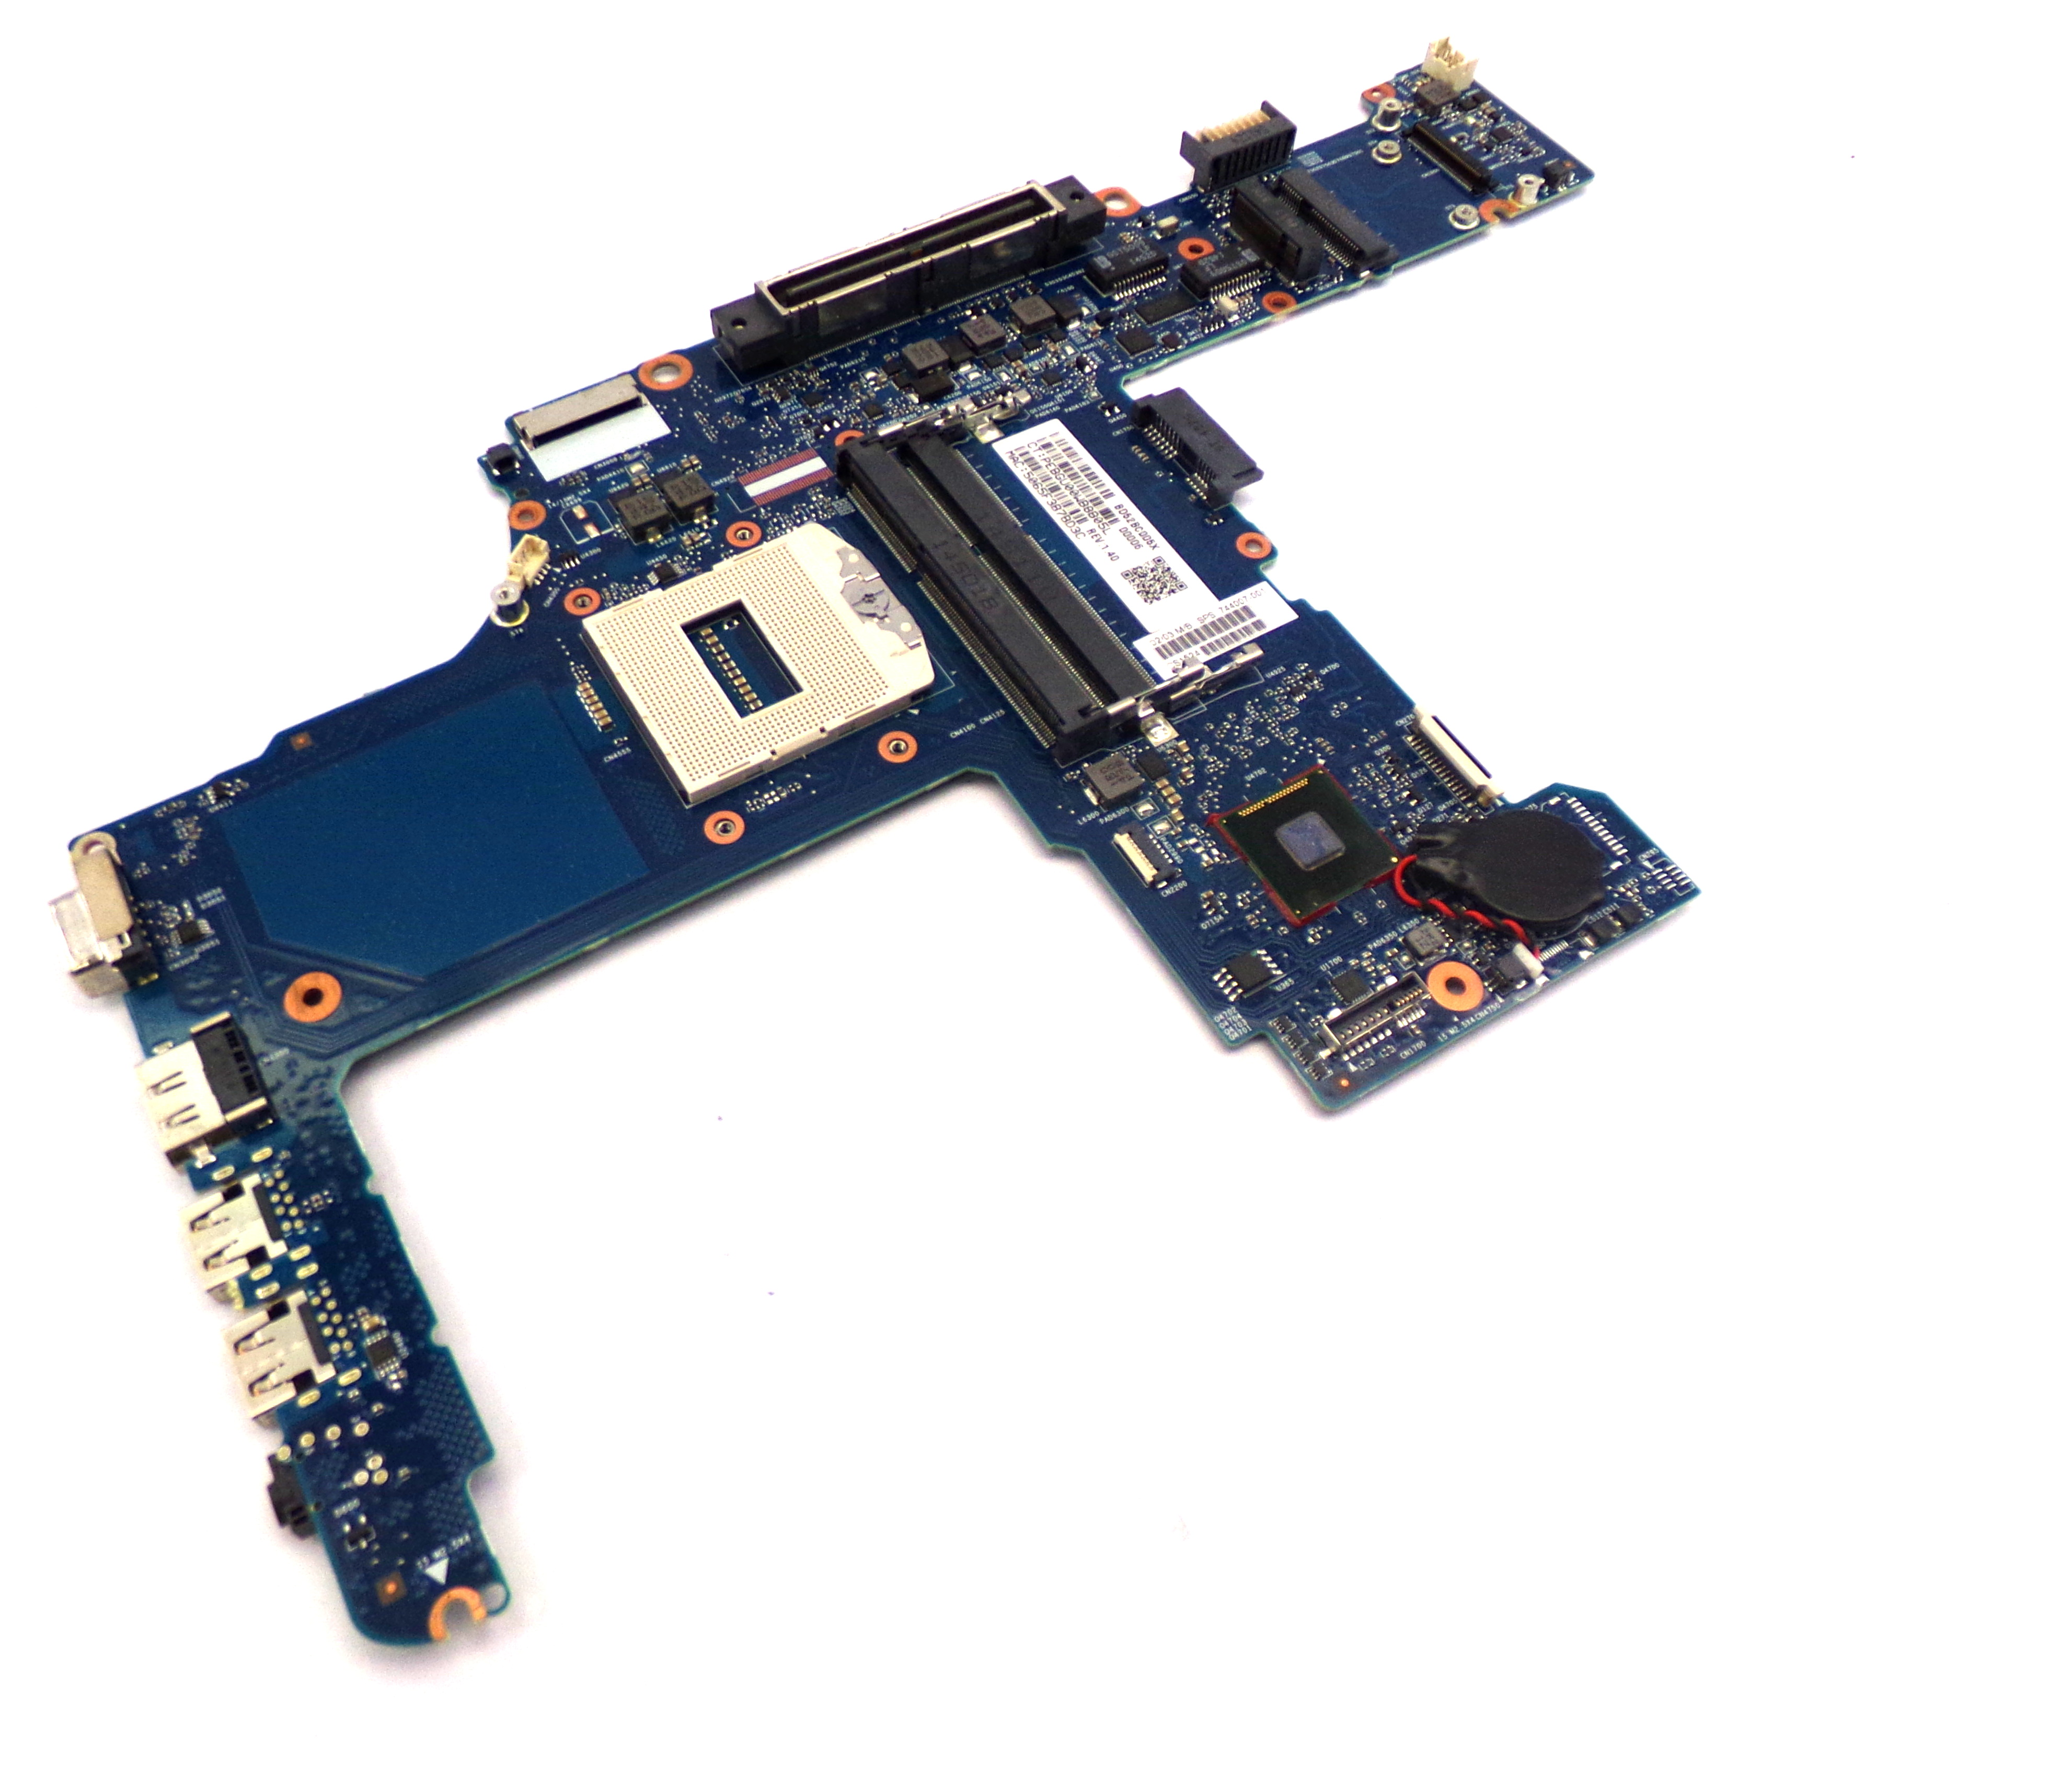 744007-001 HP ProBook 640 G1 Socket rPGA-947 Intel Motherboard